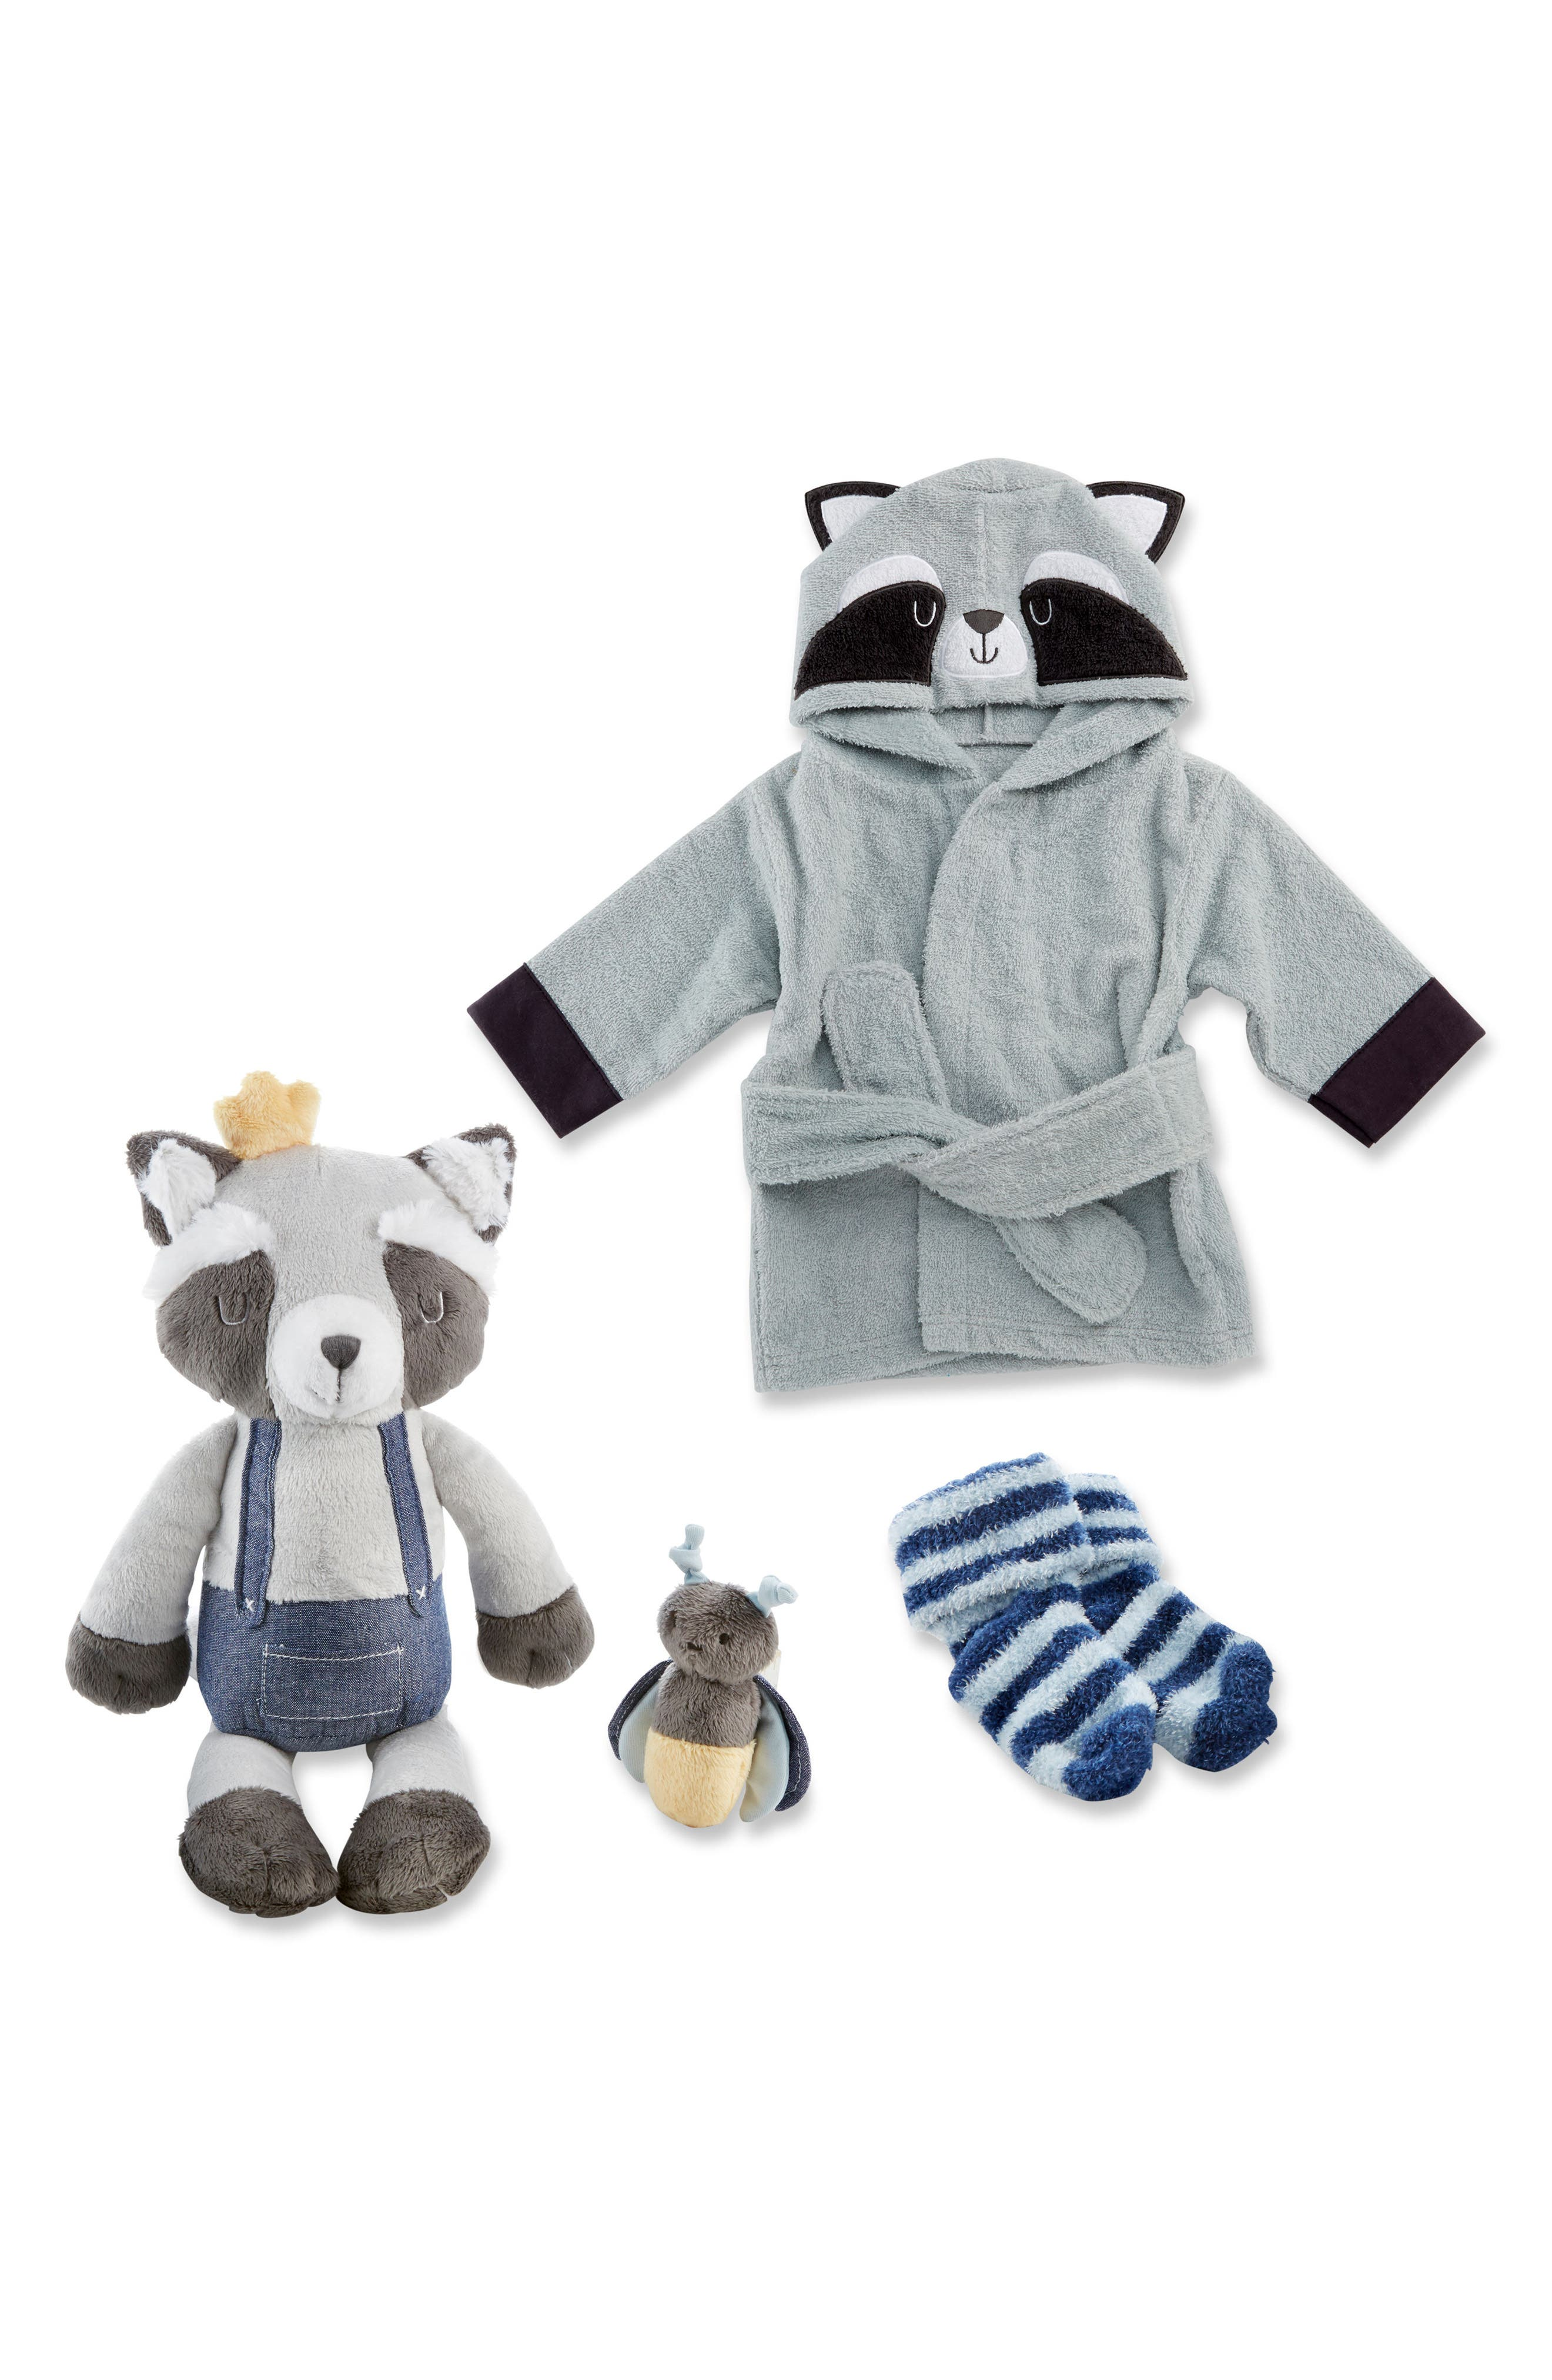 Forest Friends Raccoon Plush Robe, Fuzzy Socks, Stuffed Animal & Rattle Set,                             Main thumbnail 1, color,                             Grey/ Blue/ White